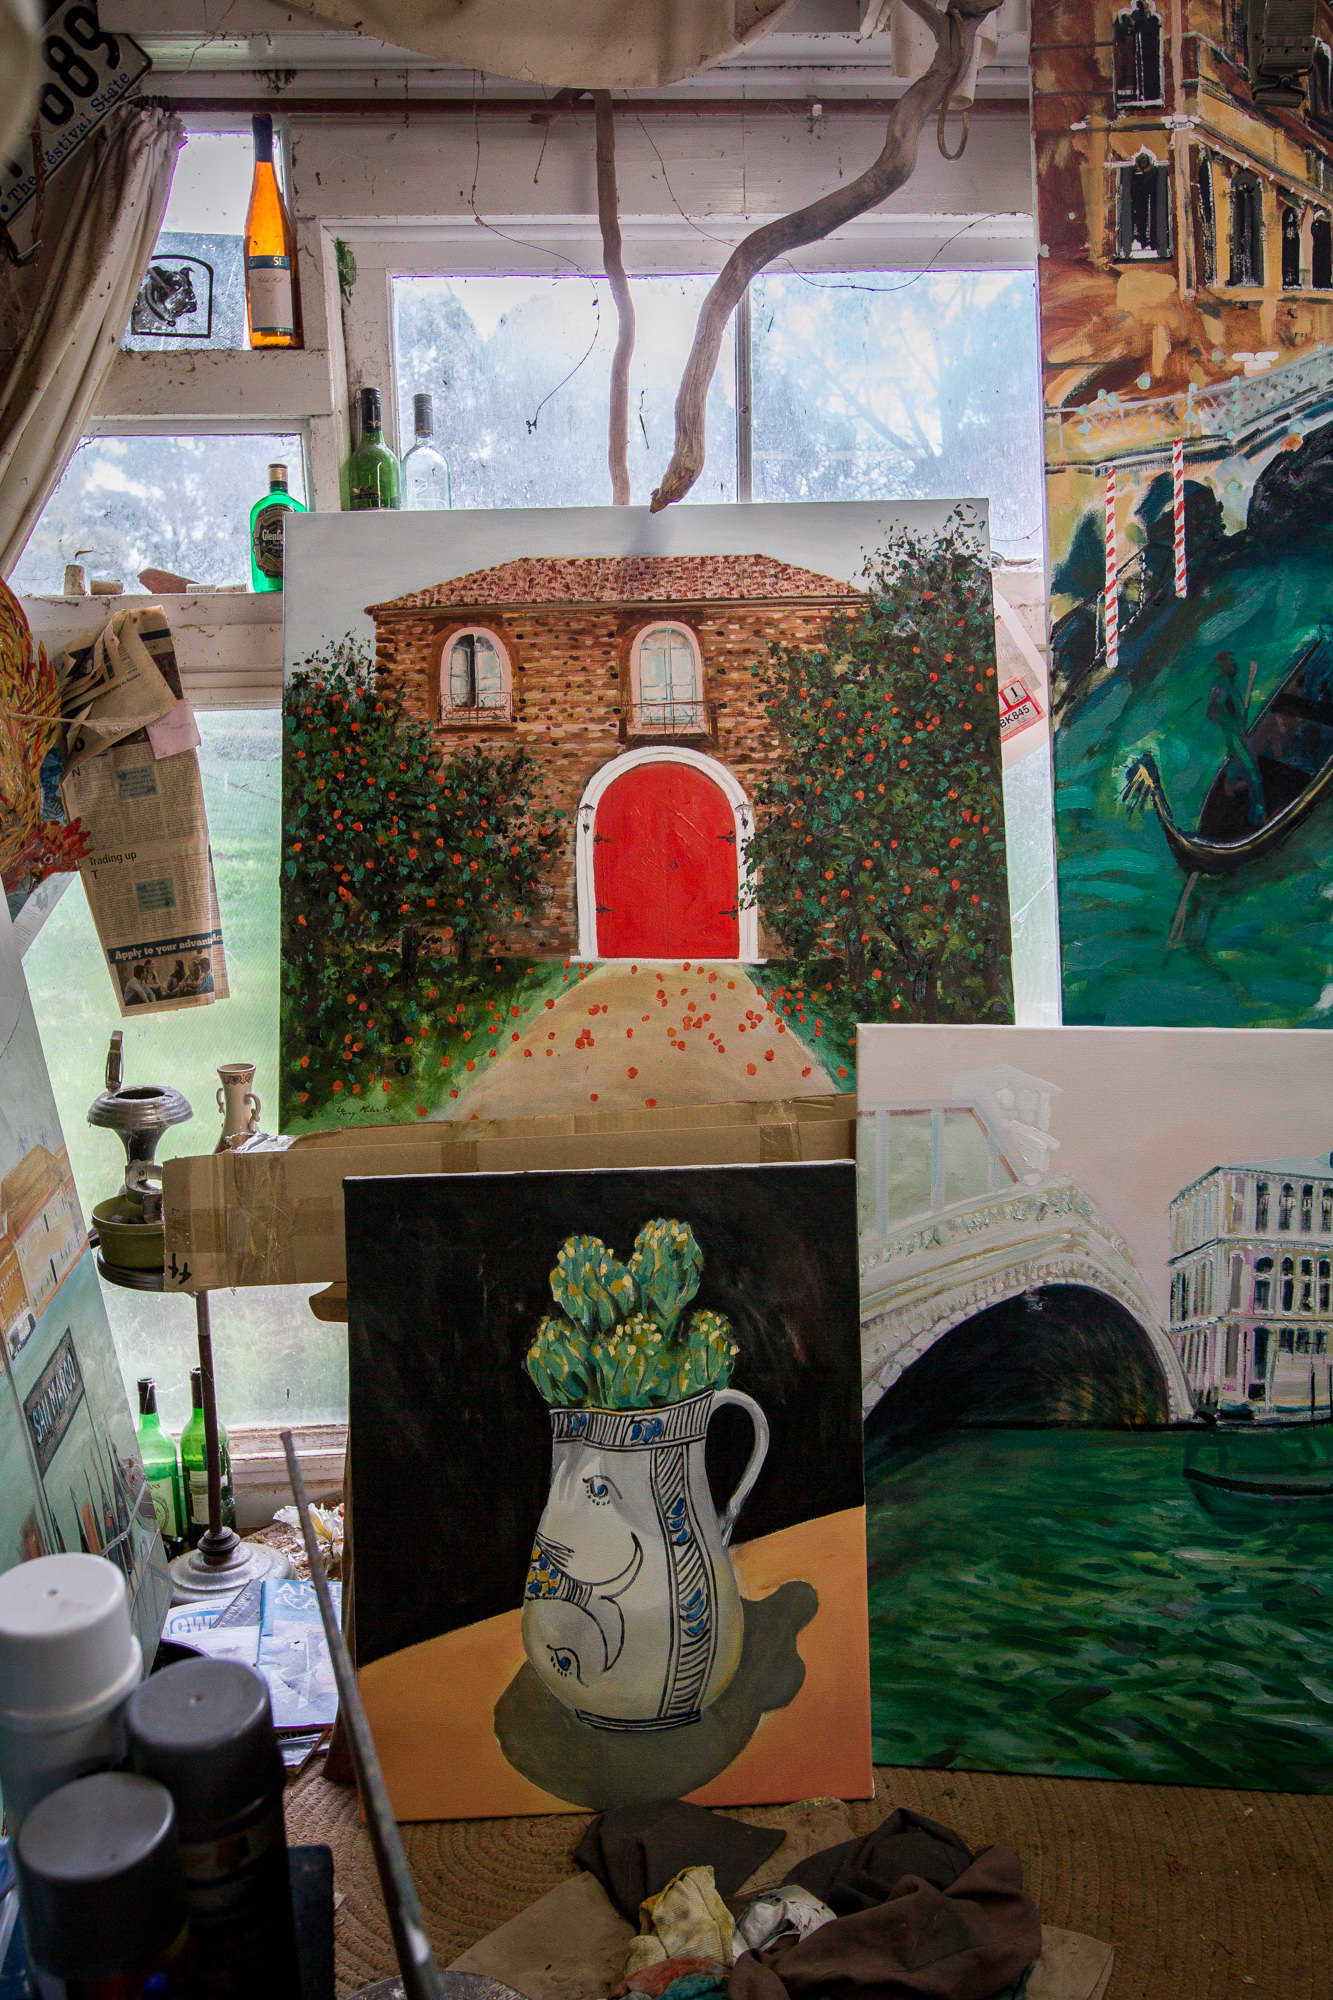 garymiles-ITALIA-Venice-Rome-Calabria-web-21.jpg